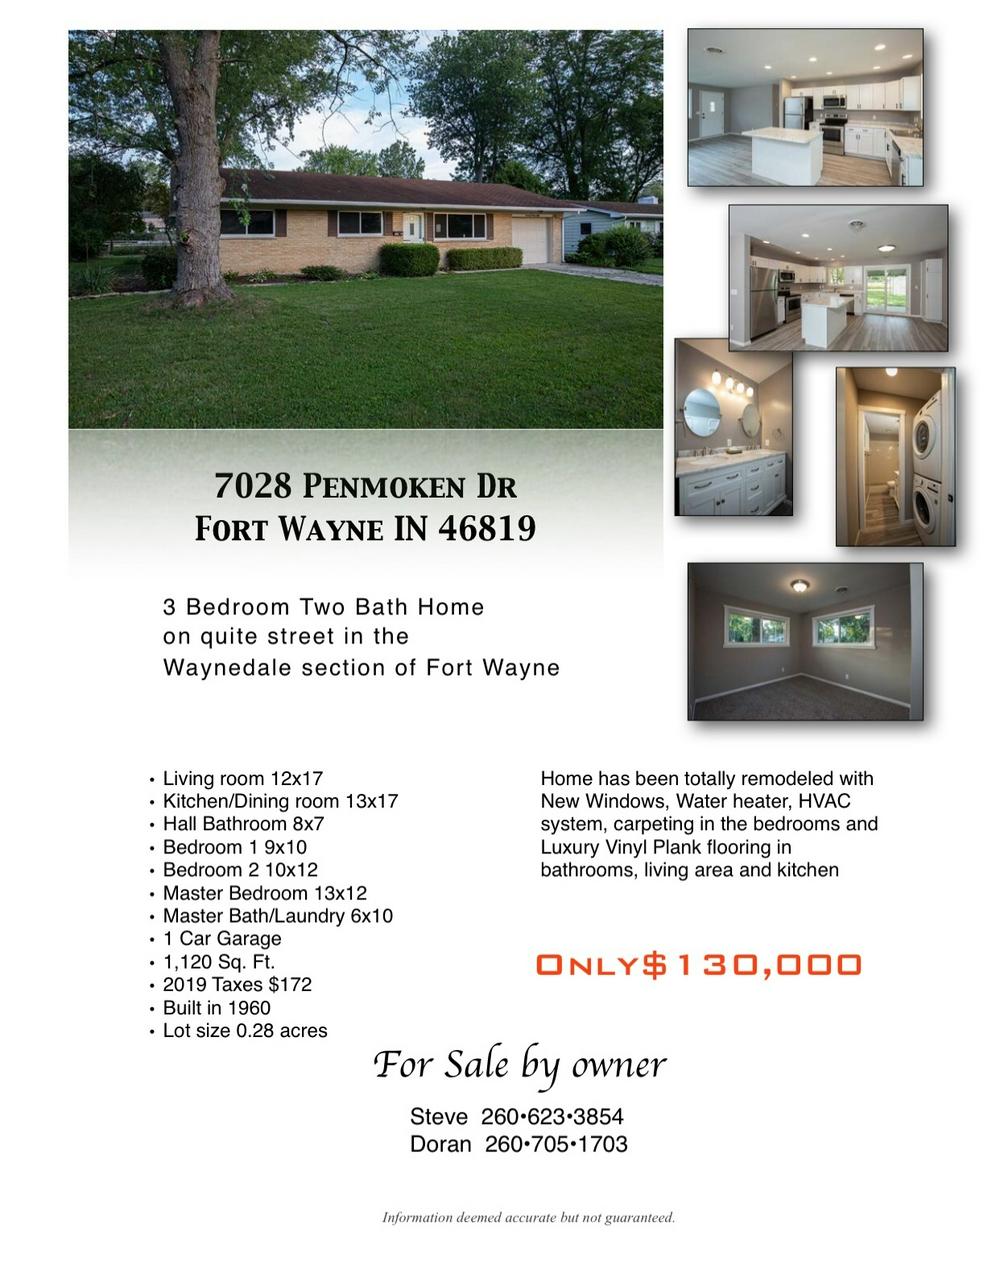 For Sale By Owner Fort Wayne : owner, wayne, Penmoken, Drive, Wayne,, 46819, Beds,, Single, Family, Owner, ForSaleByOwner.com